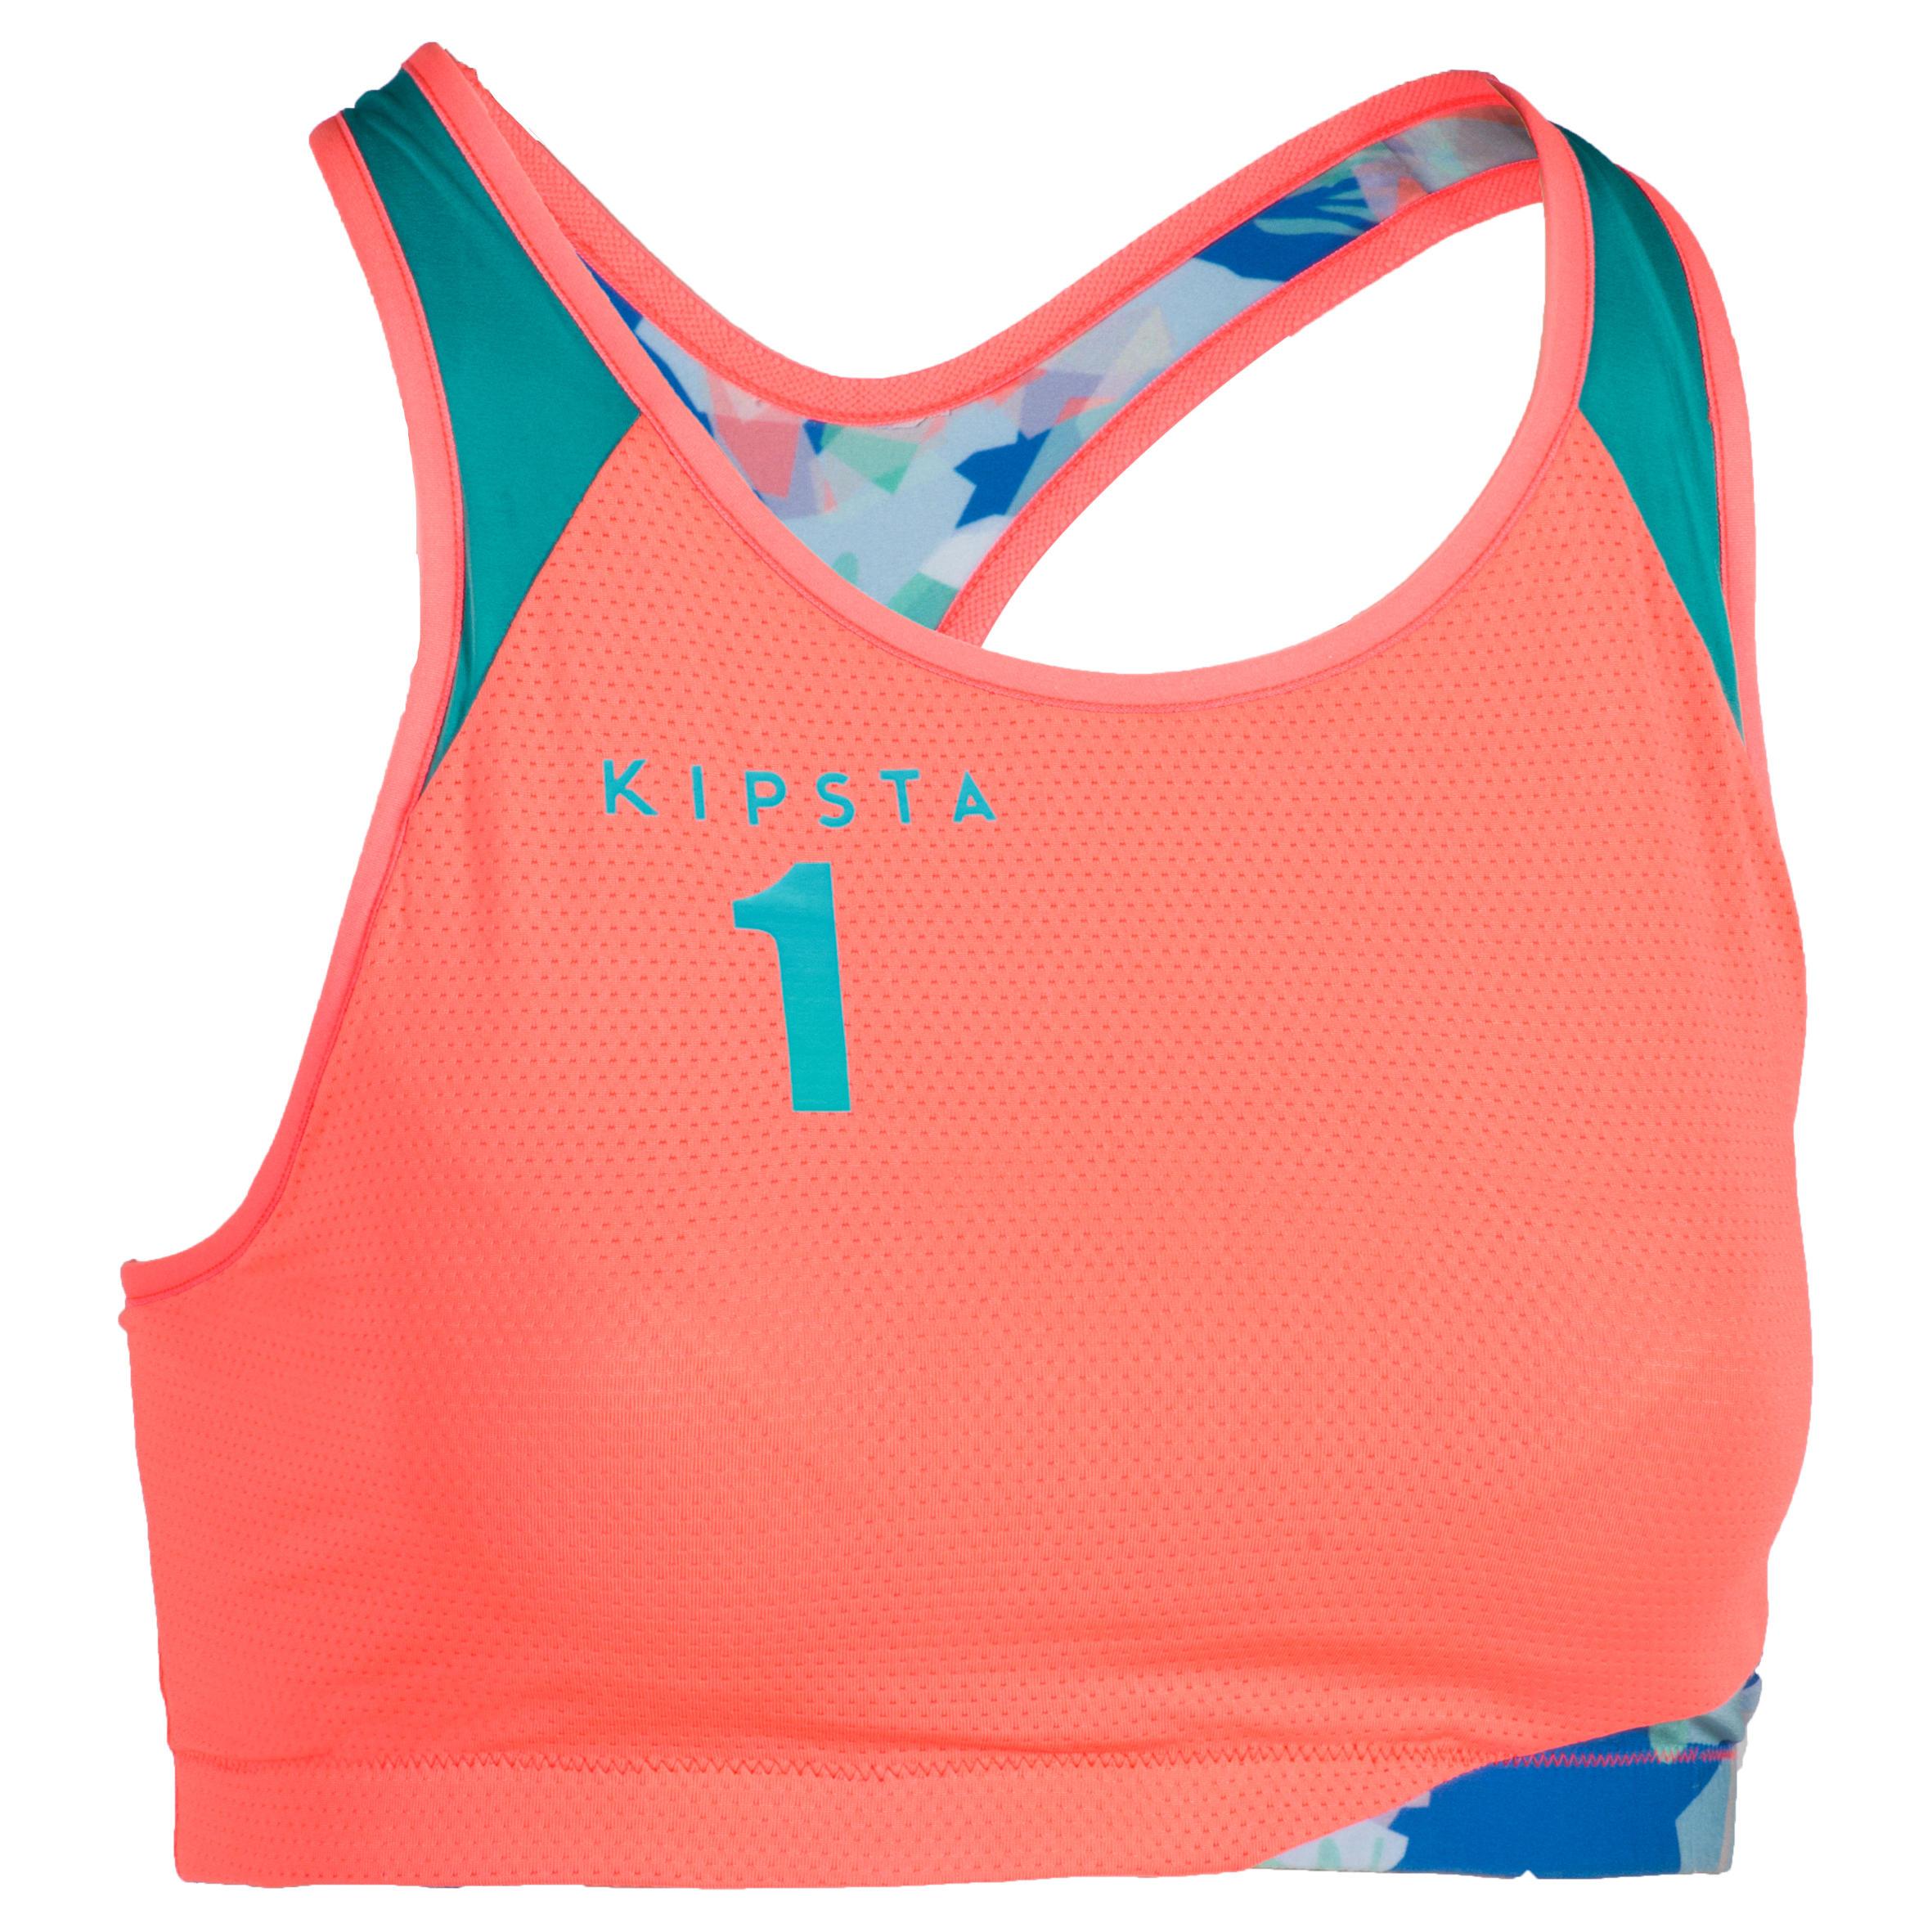 BV 500 Reversible Beach Volleyball Sports Bra - Orange